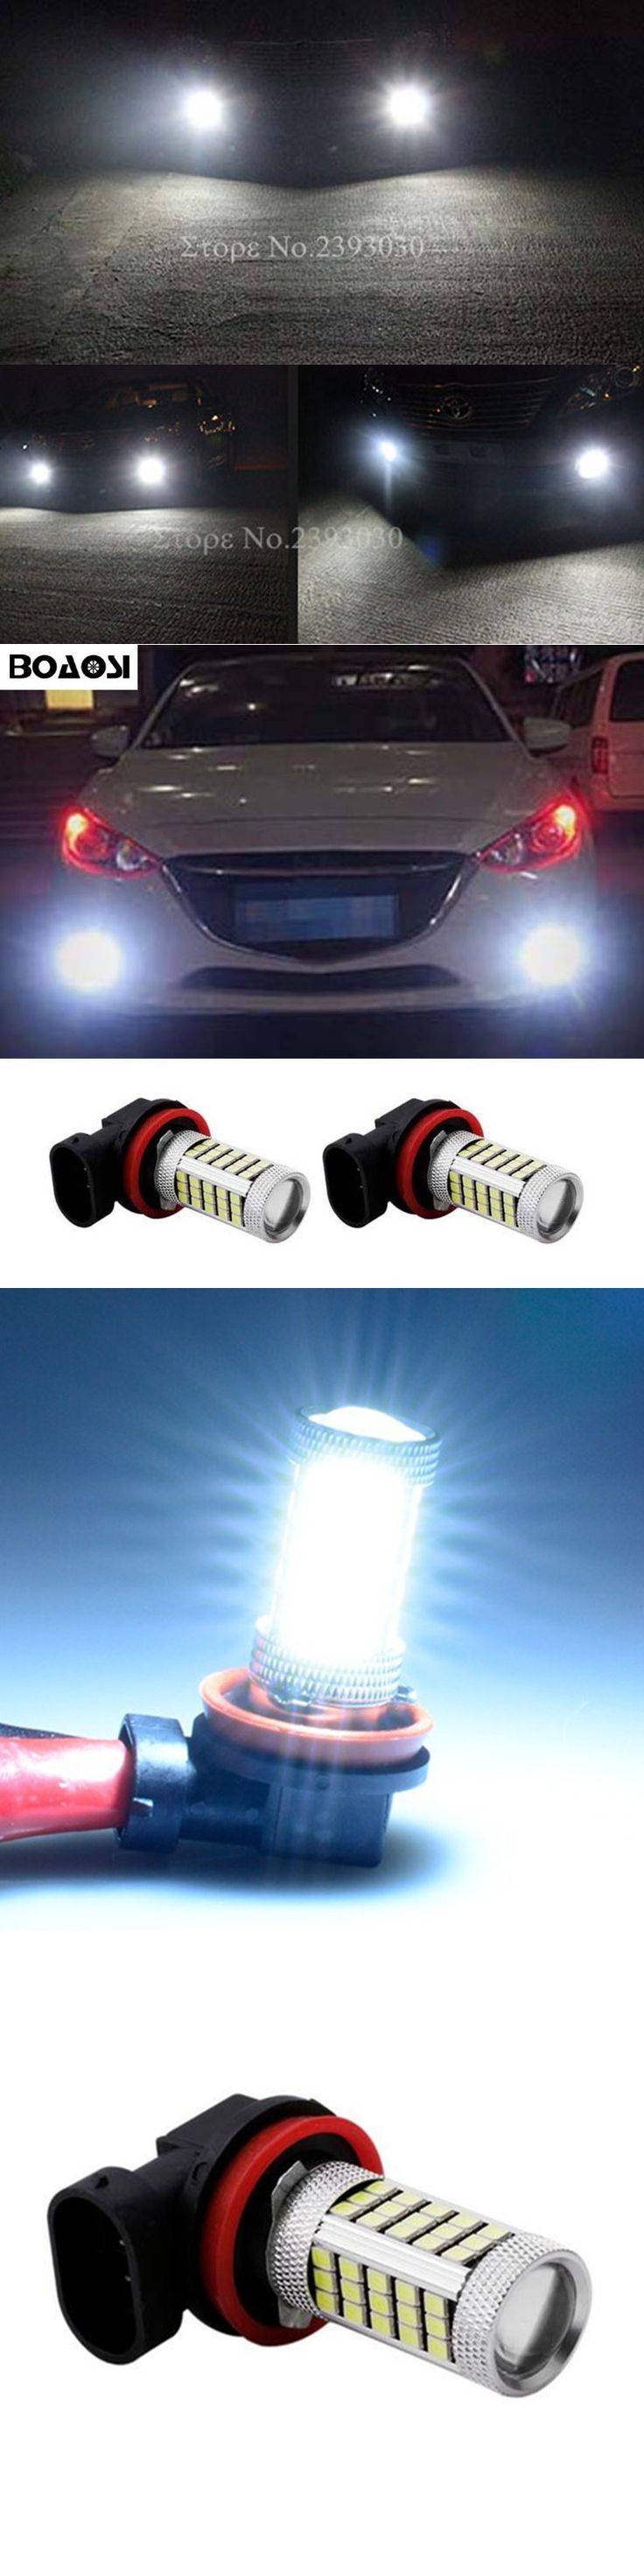 BOAOSI 2x Super White H8 H11 CREE Chip 2835 LED Fog Light Driving Bulbs for mazda 3 5 6 xc-5 cx-7 axela atenza Car Accessories